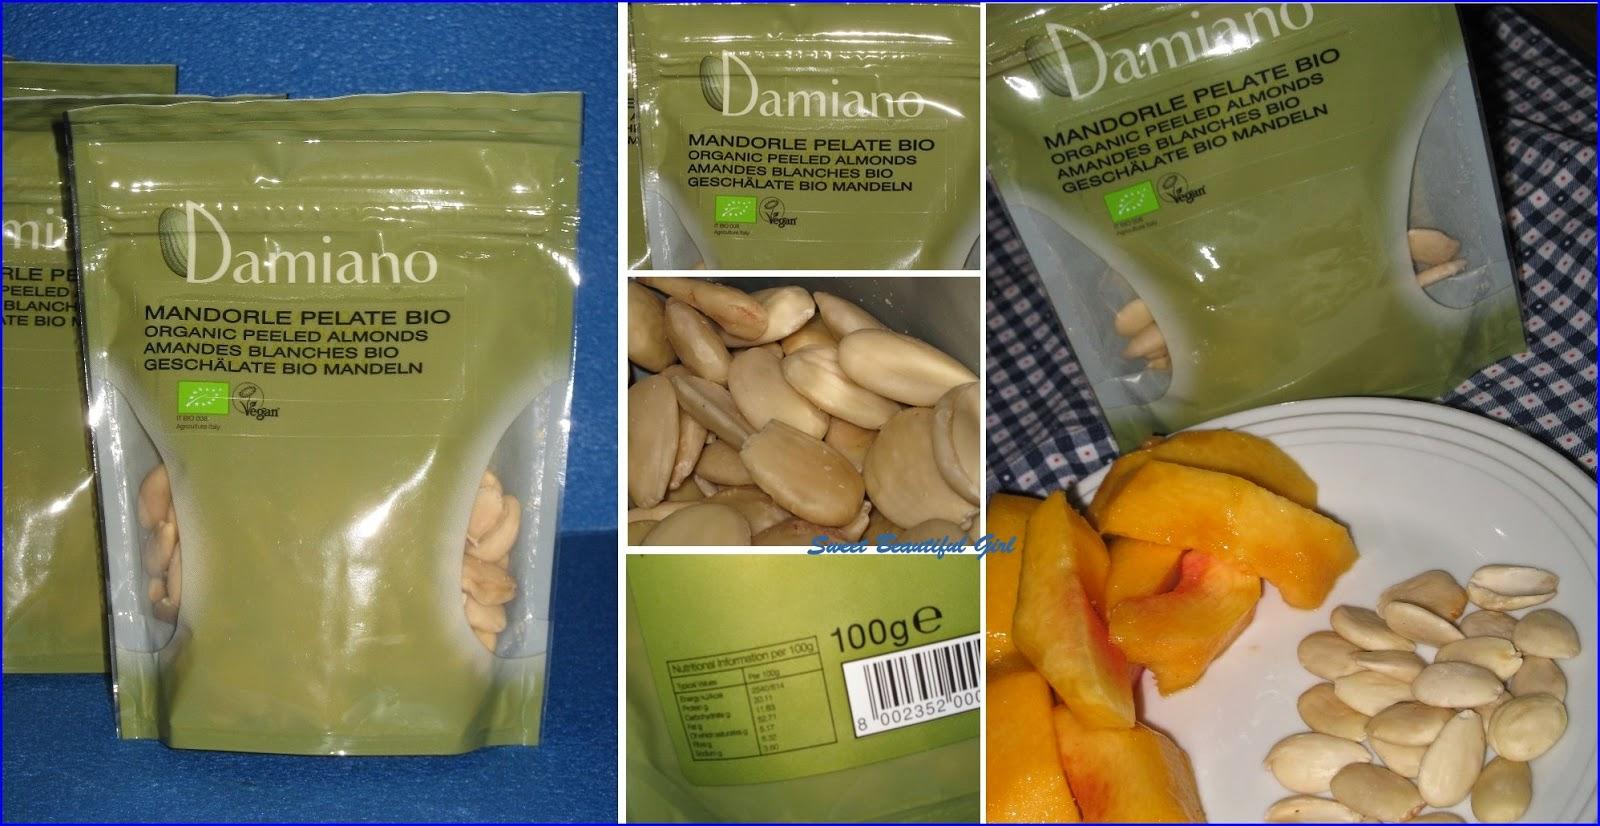 biologica Damiano Think Organic